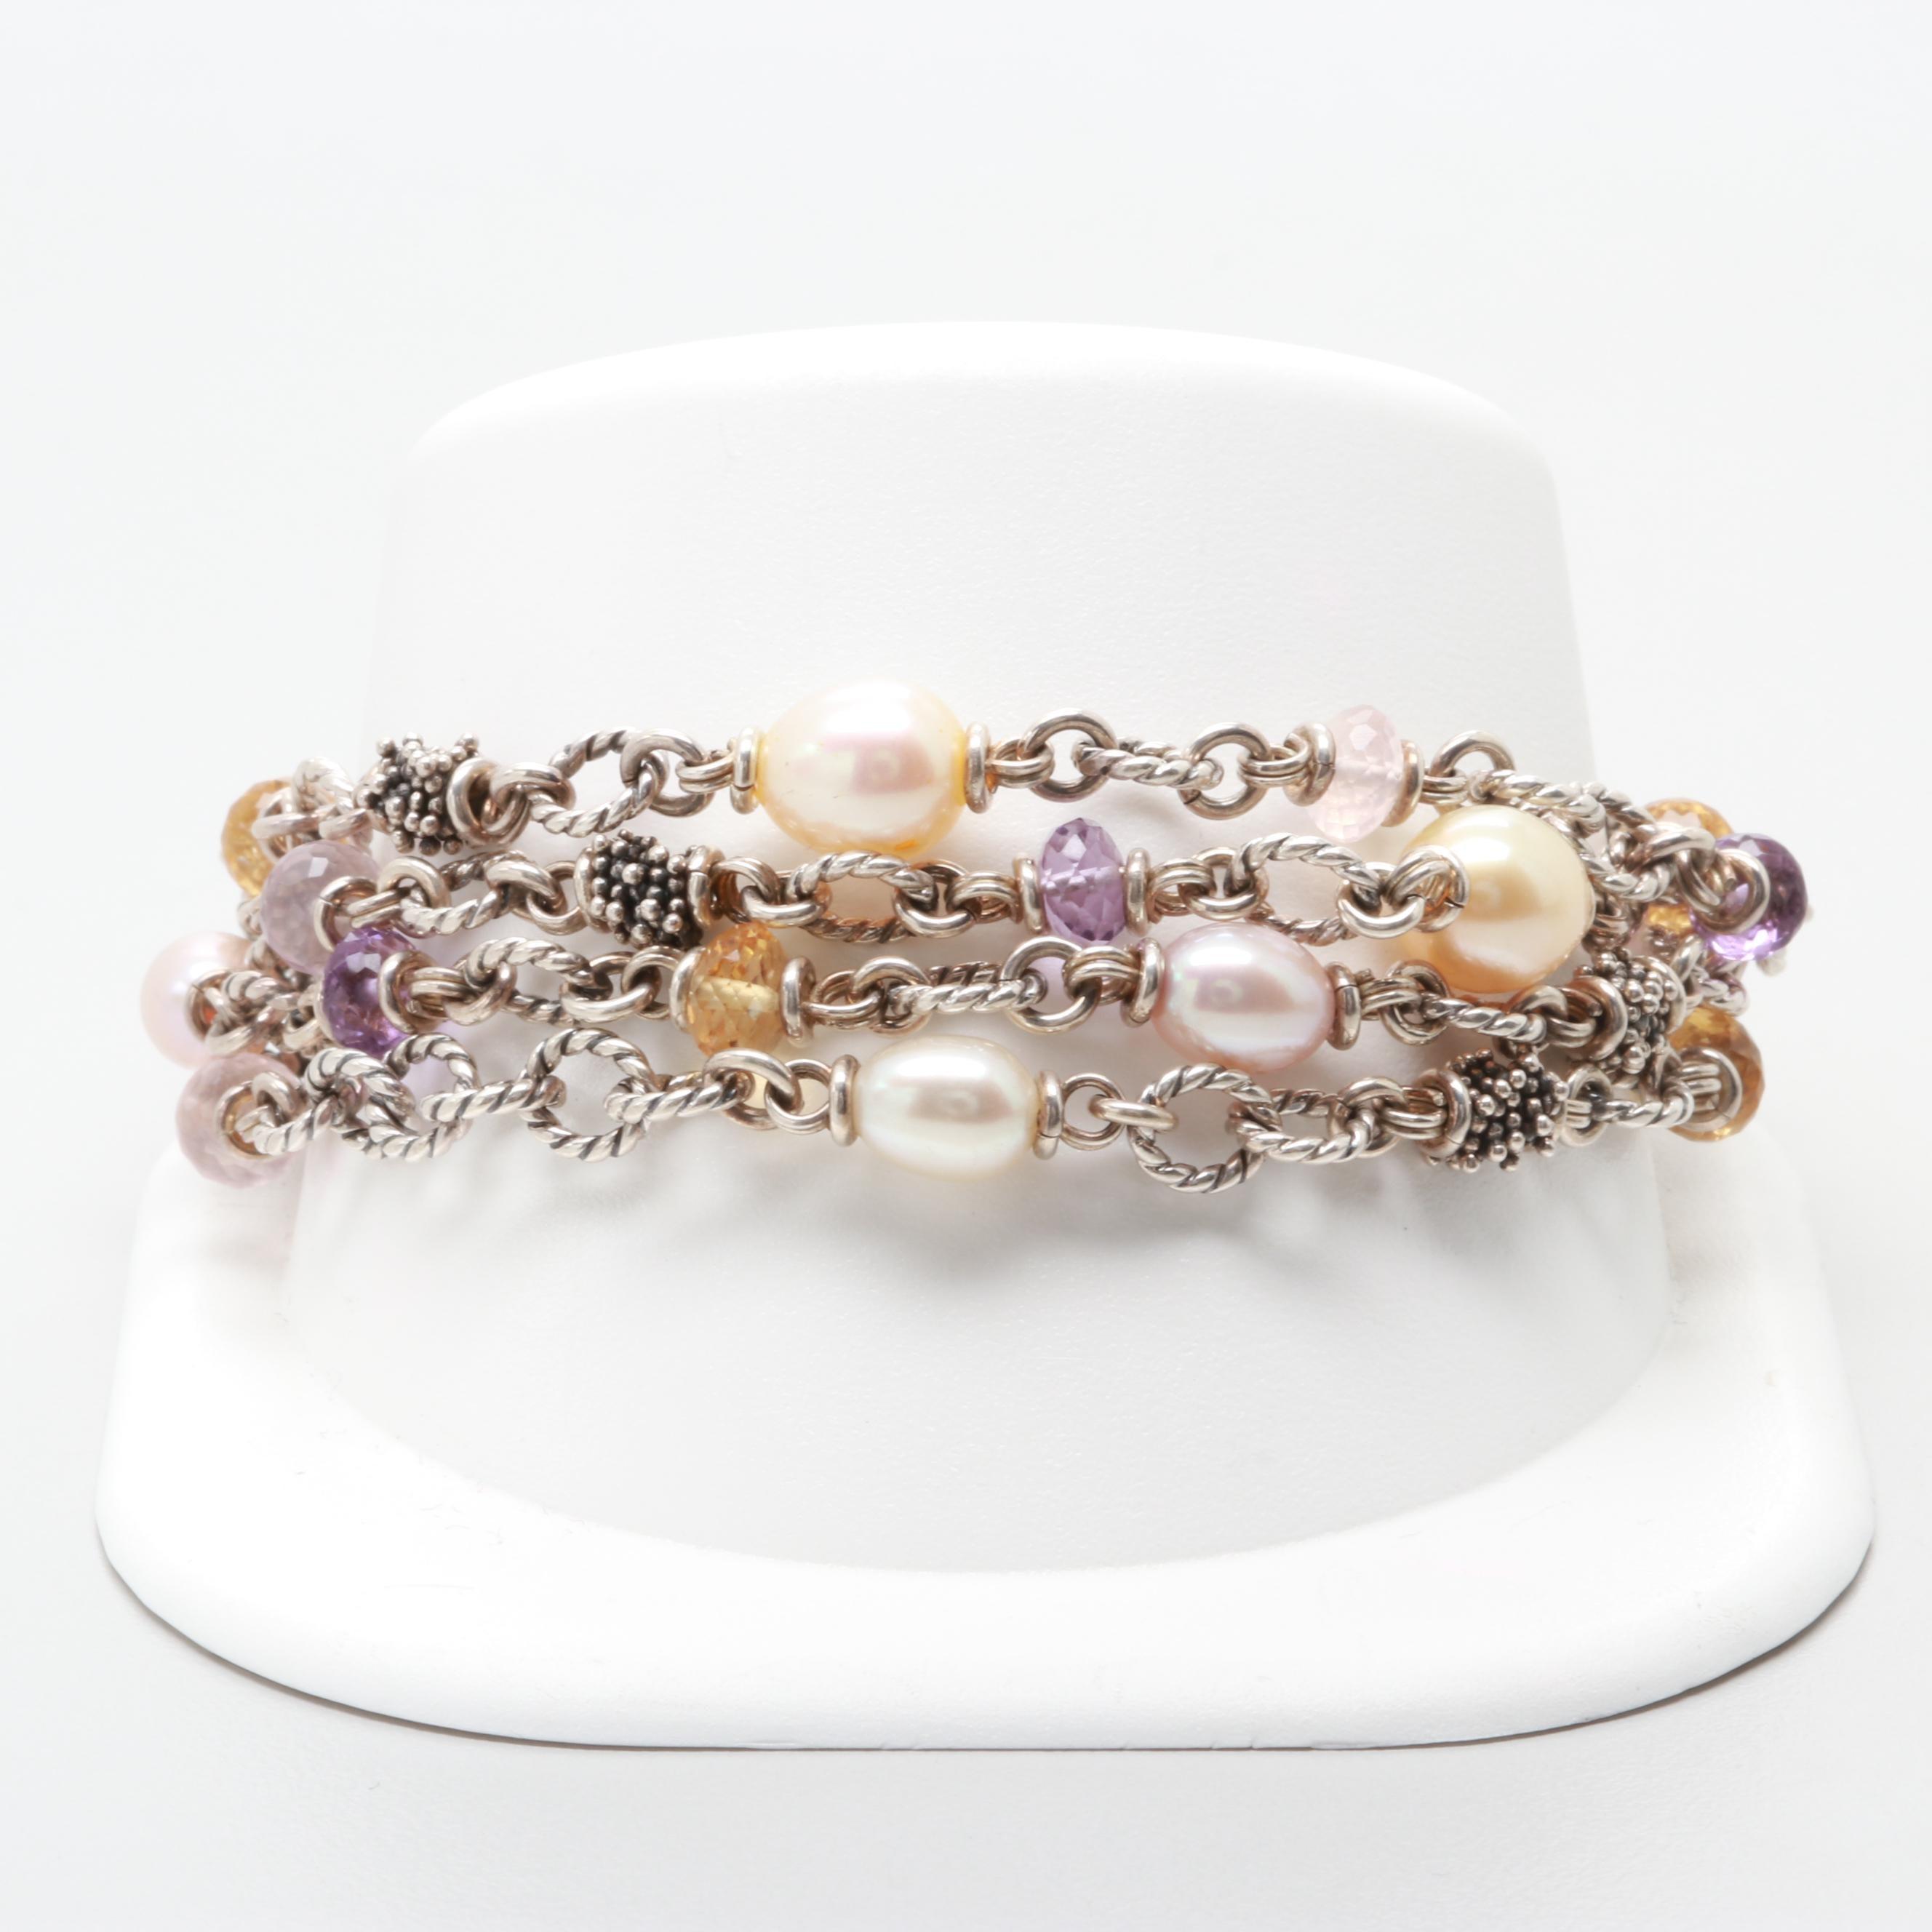 Michael Dawkins Sterling Silver Cultured Pearl, Amethyst and Quartz Bracelet